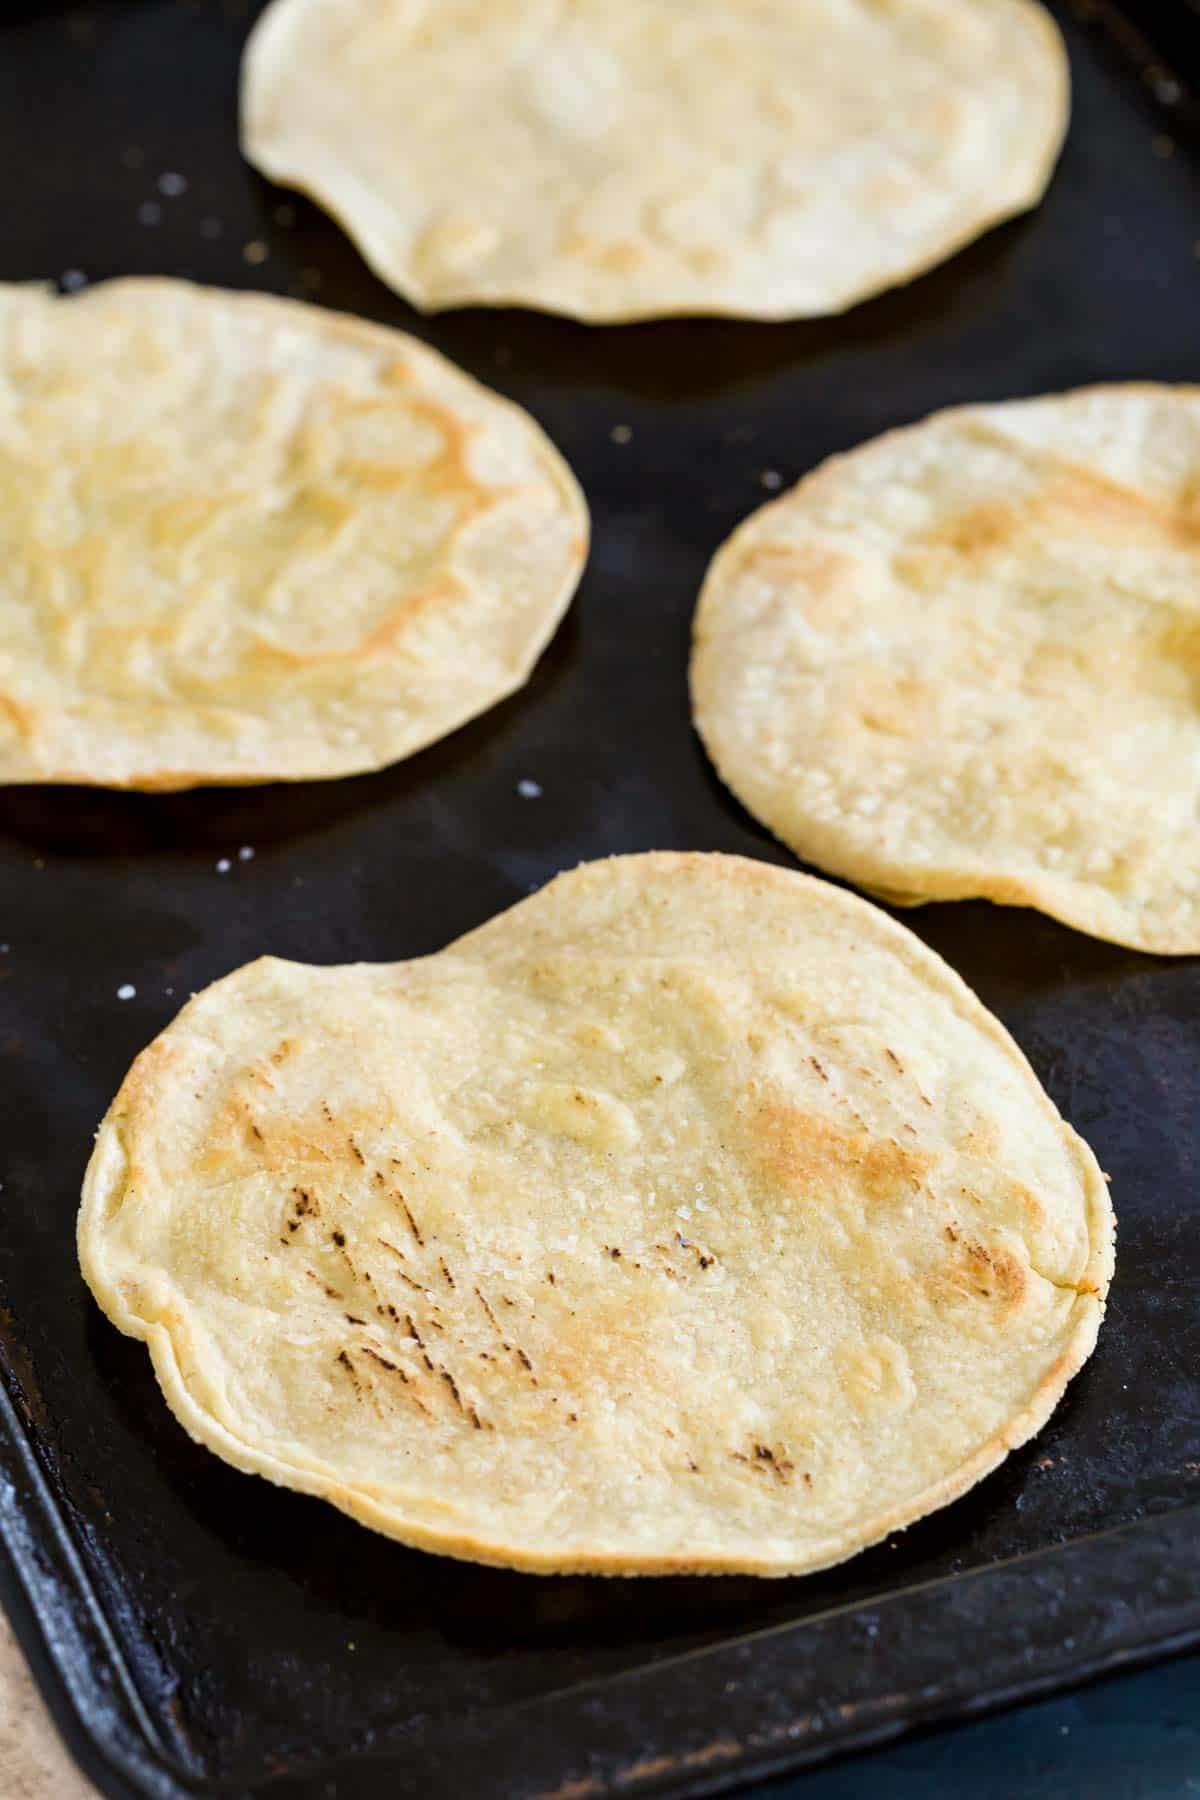 four baked tostada shells on a baking pan